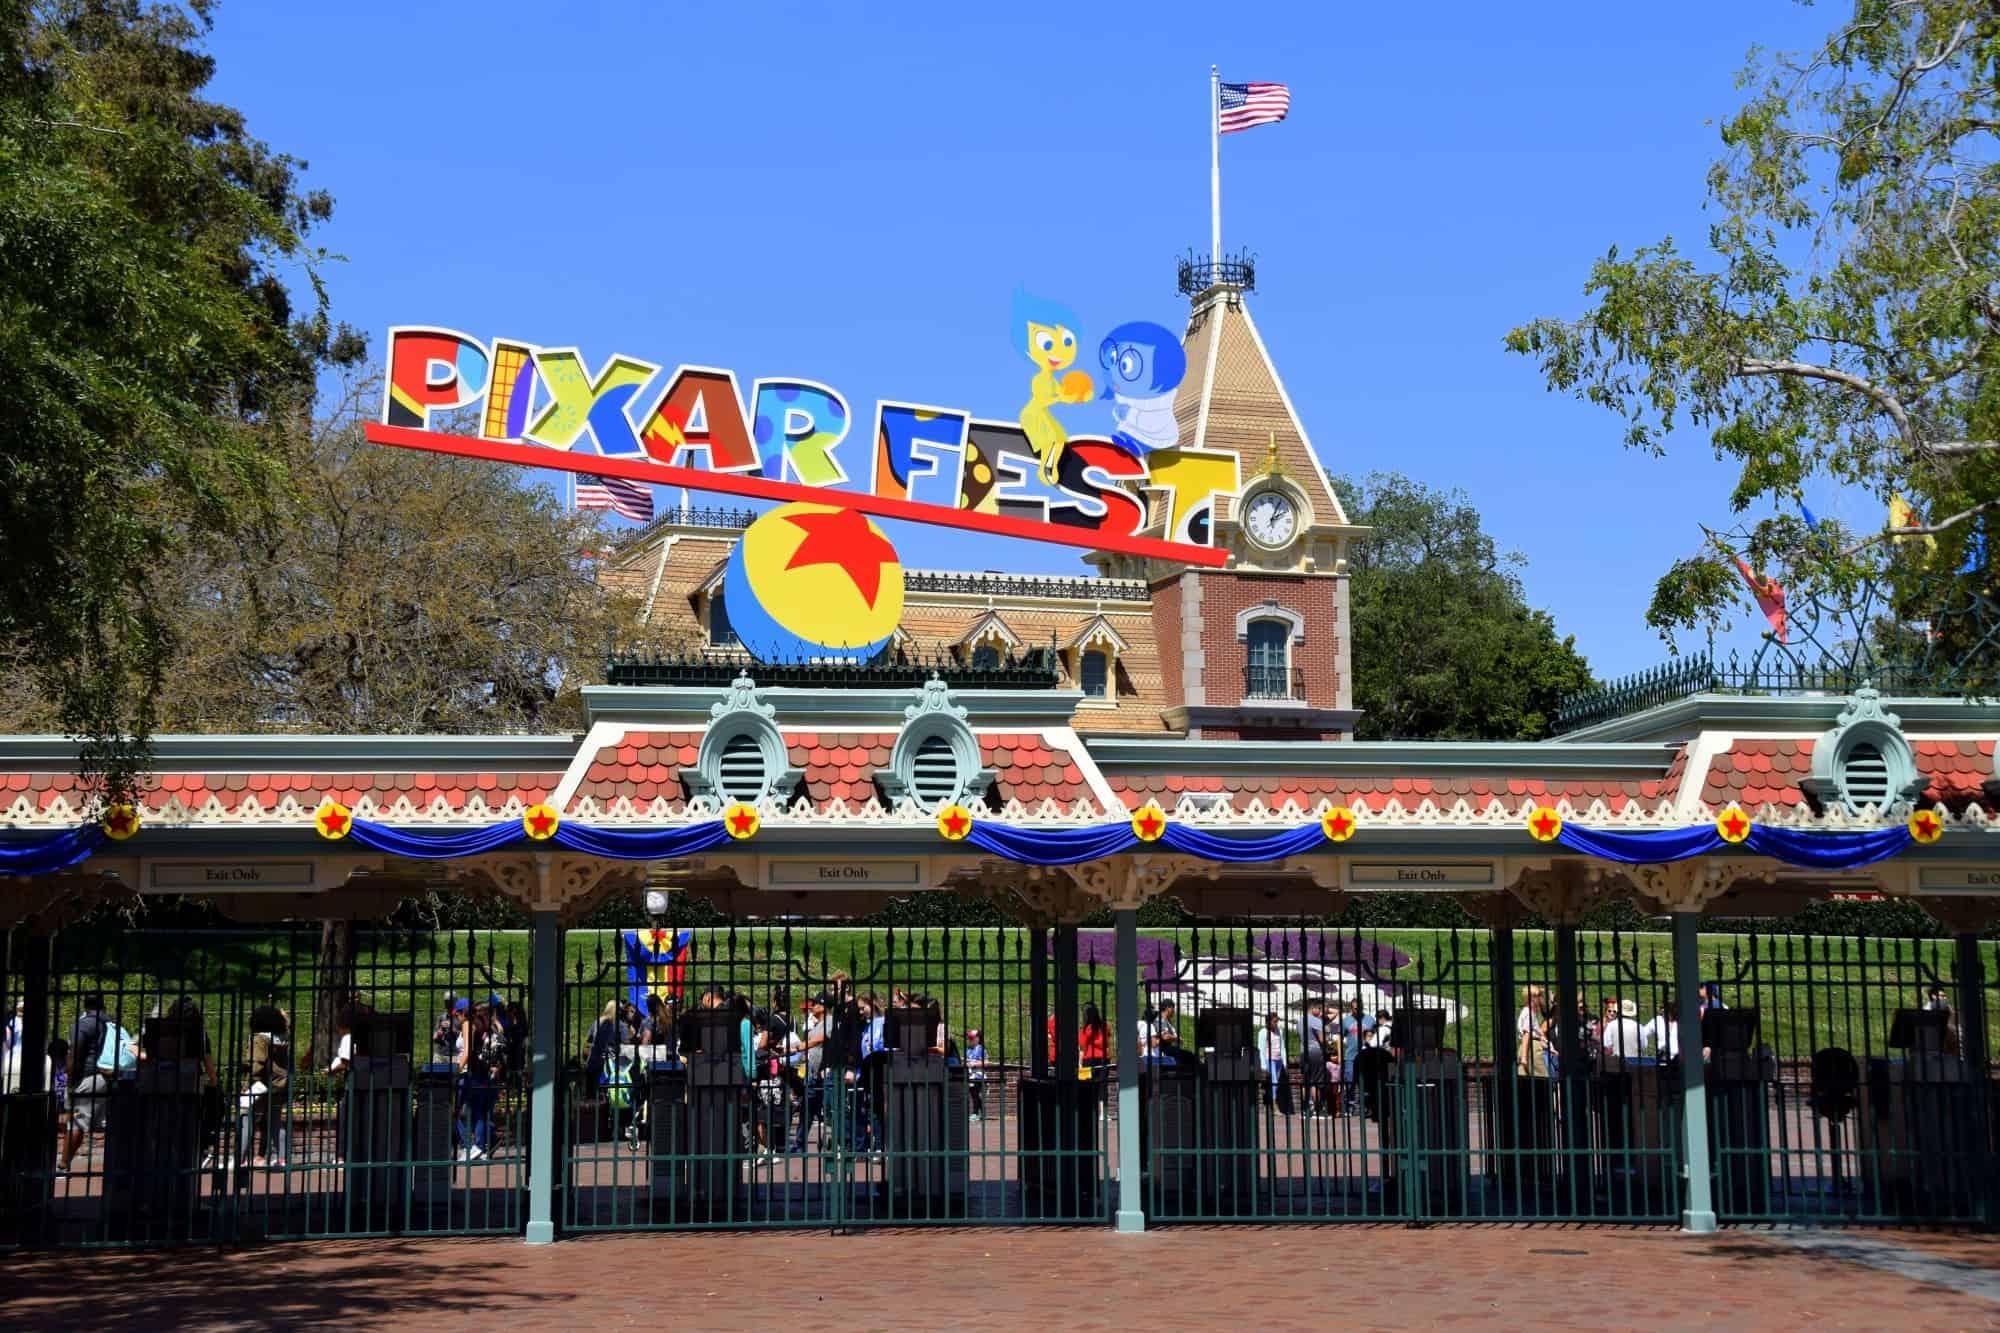 10 Things You Must do at Pixar Fest at the Disneyland Resort